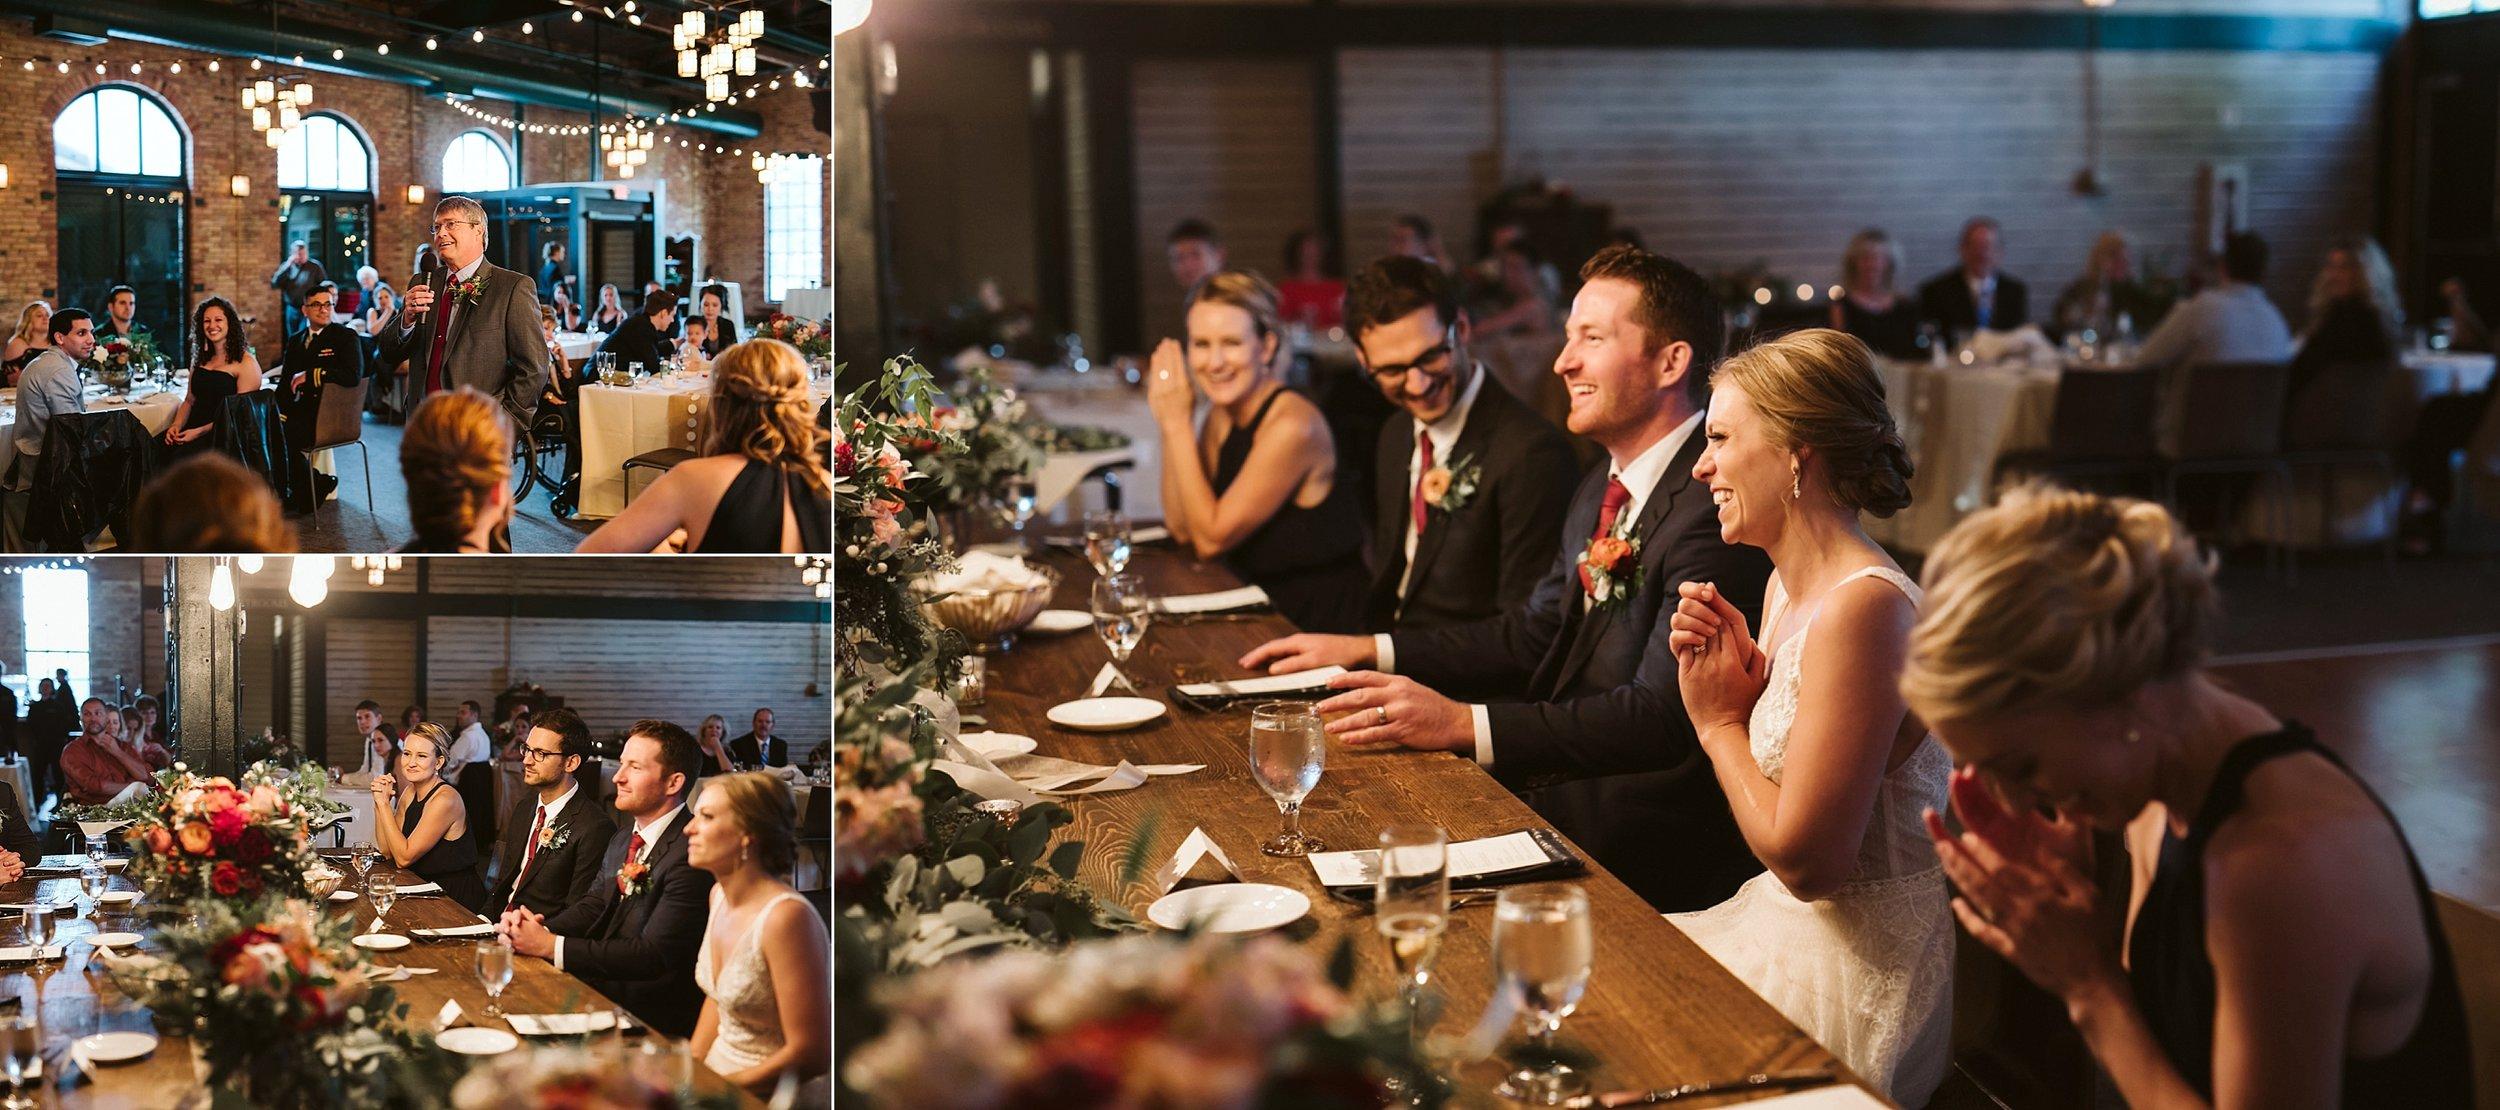 Nicollet-Island-Pavilion-Minneapolis-September-Coral-Navy-Wedding-139.jpg